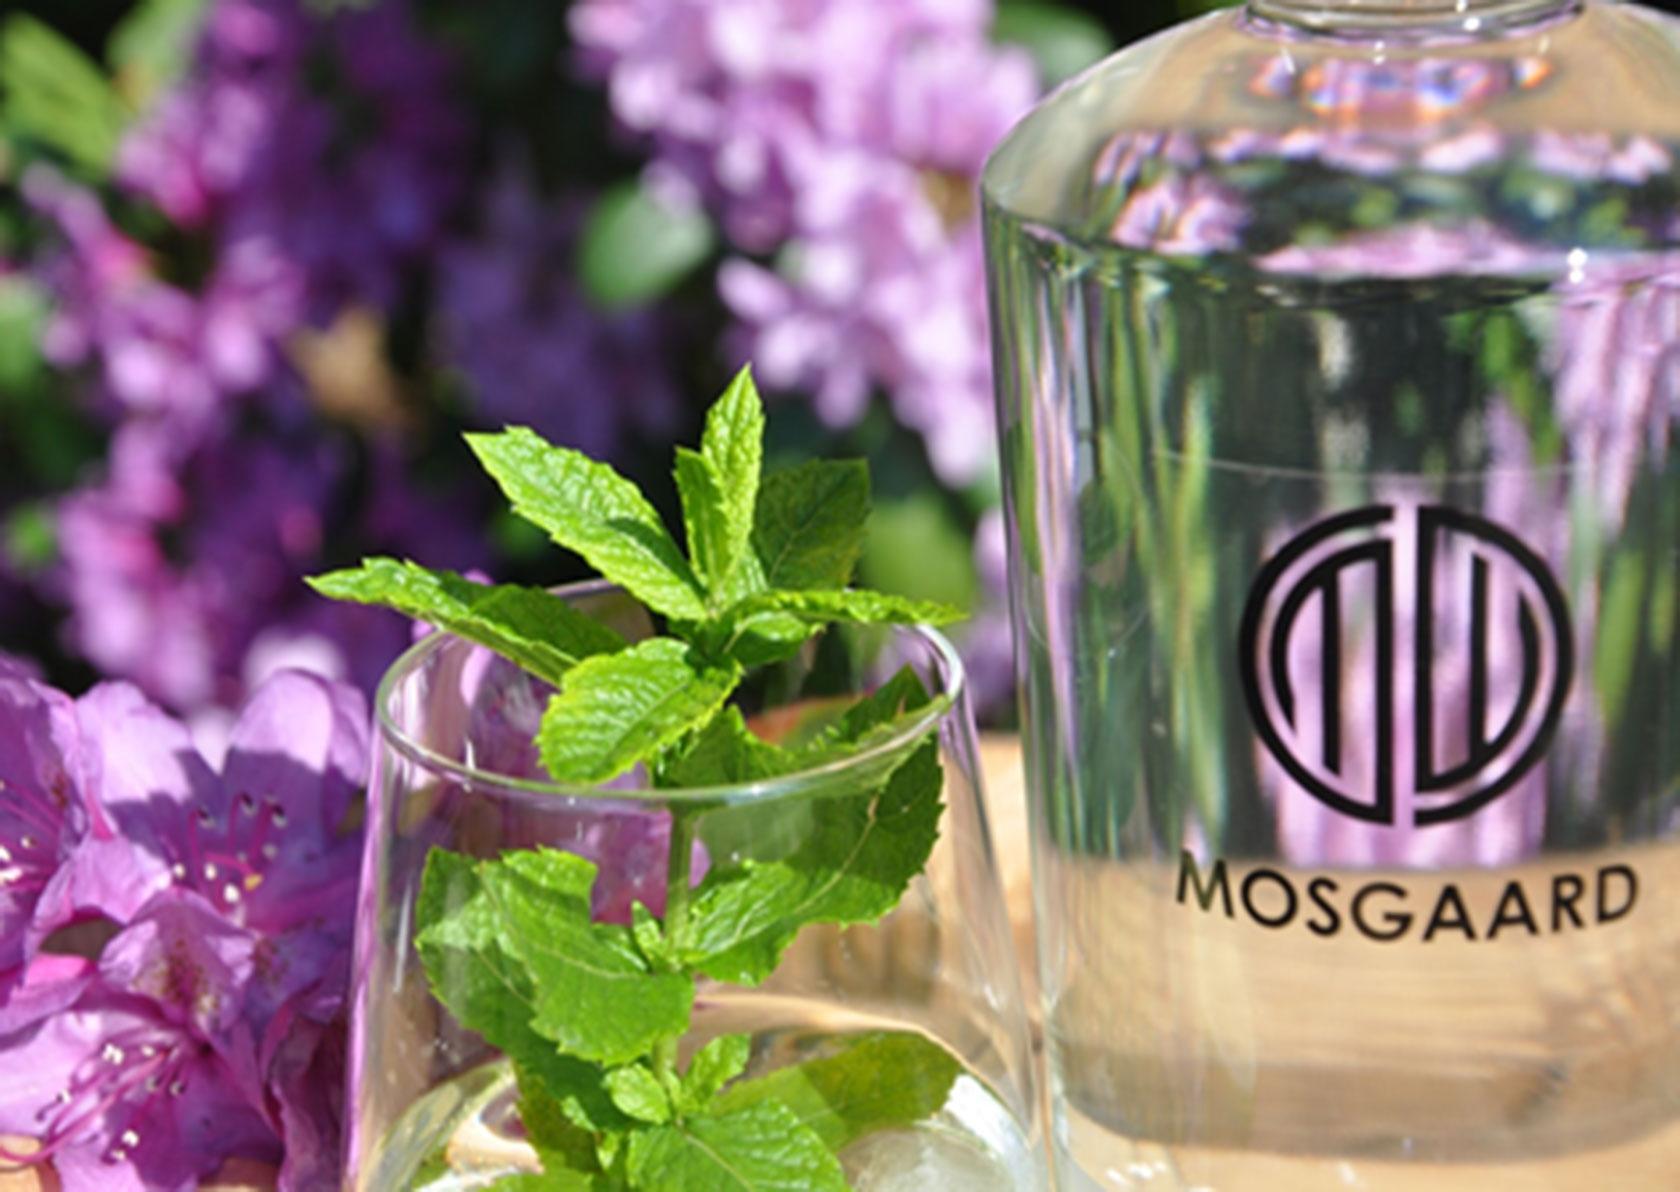 Mosgaard Gin